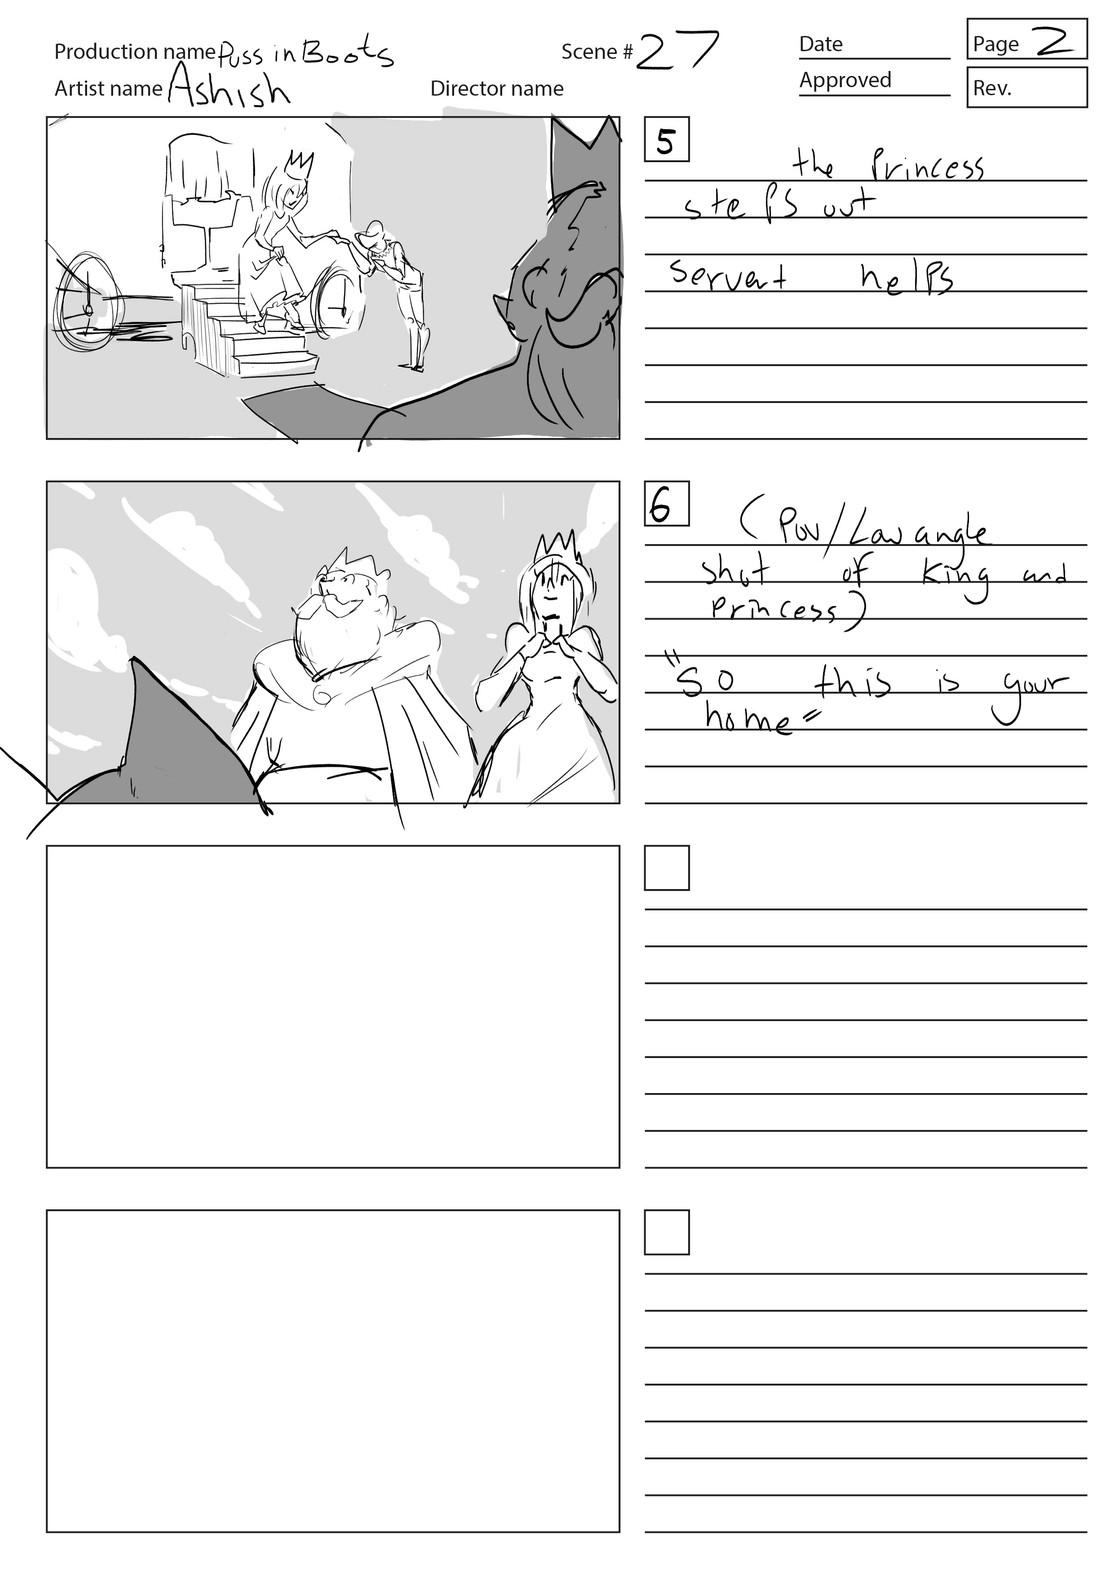 page 27_2.jpg